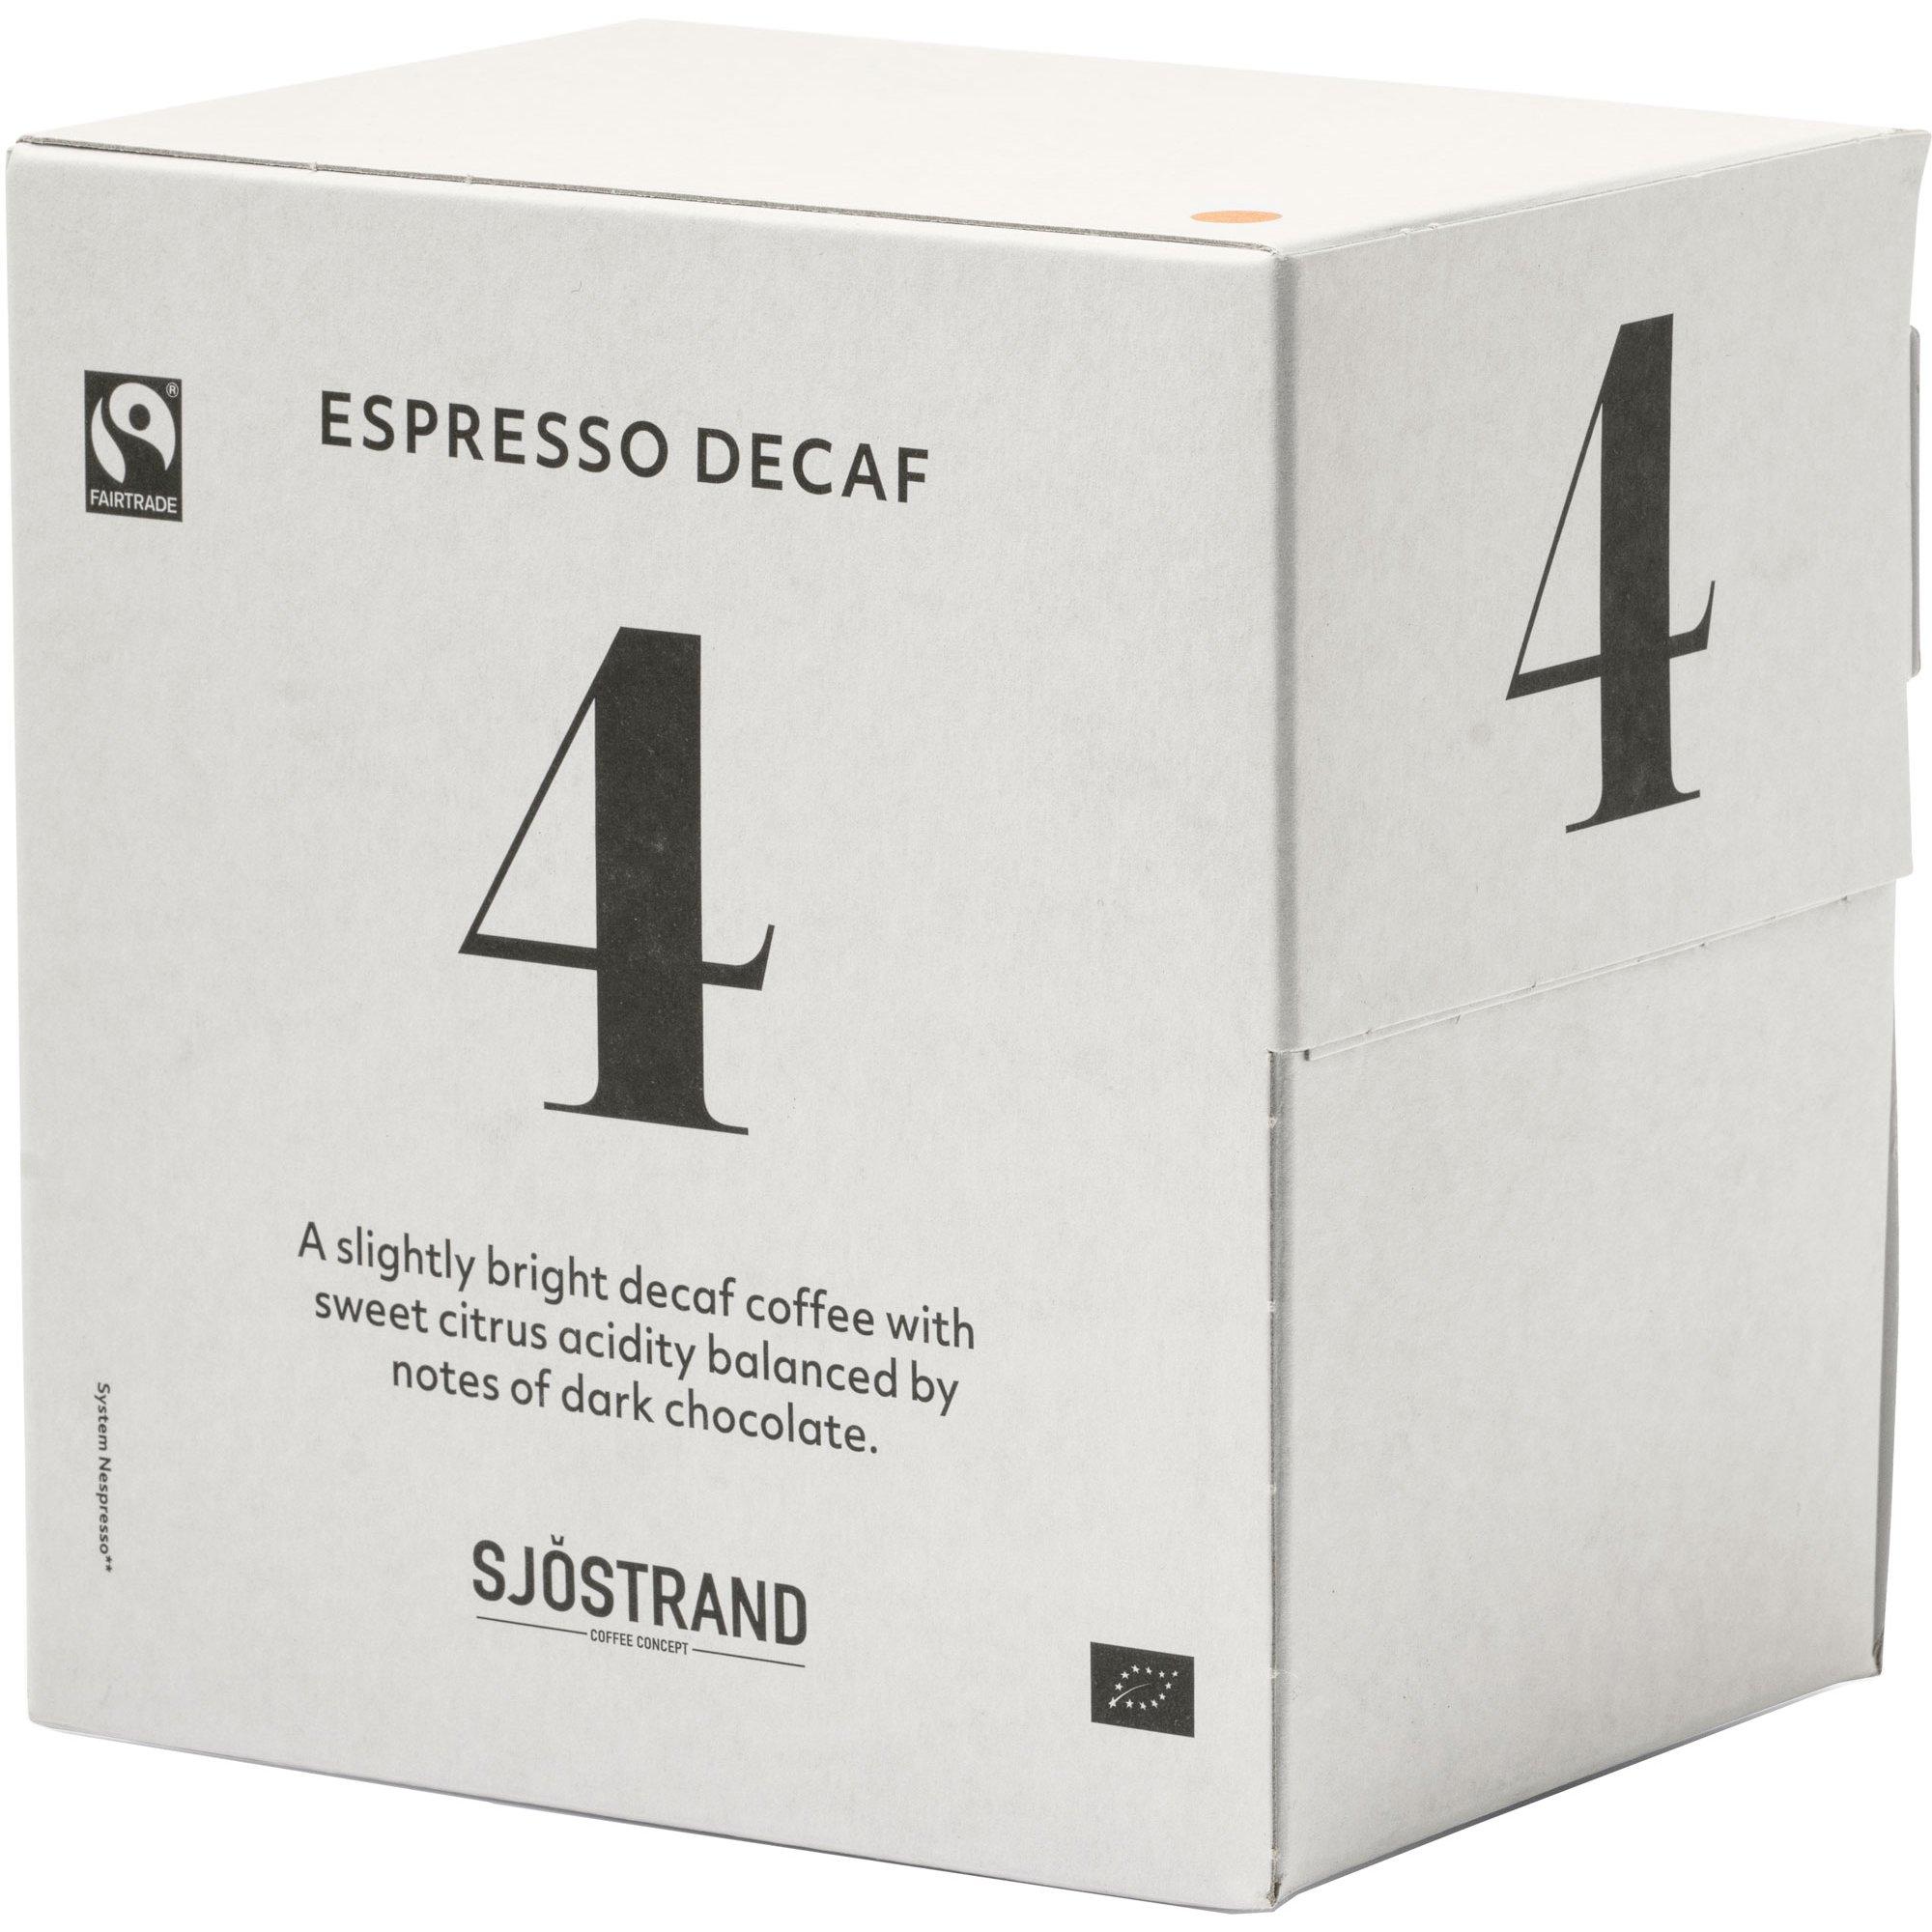 Sjöstrand Sjöstrand N°4 Espress Decaf Kapslar 100 pack